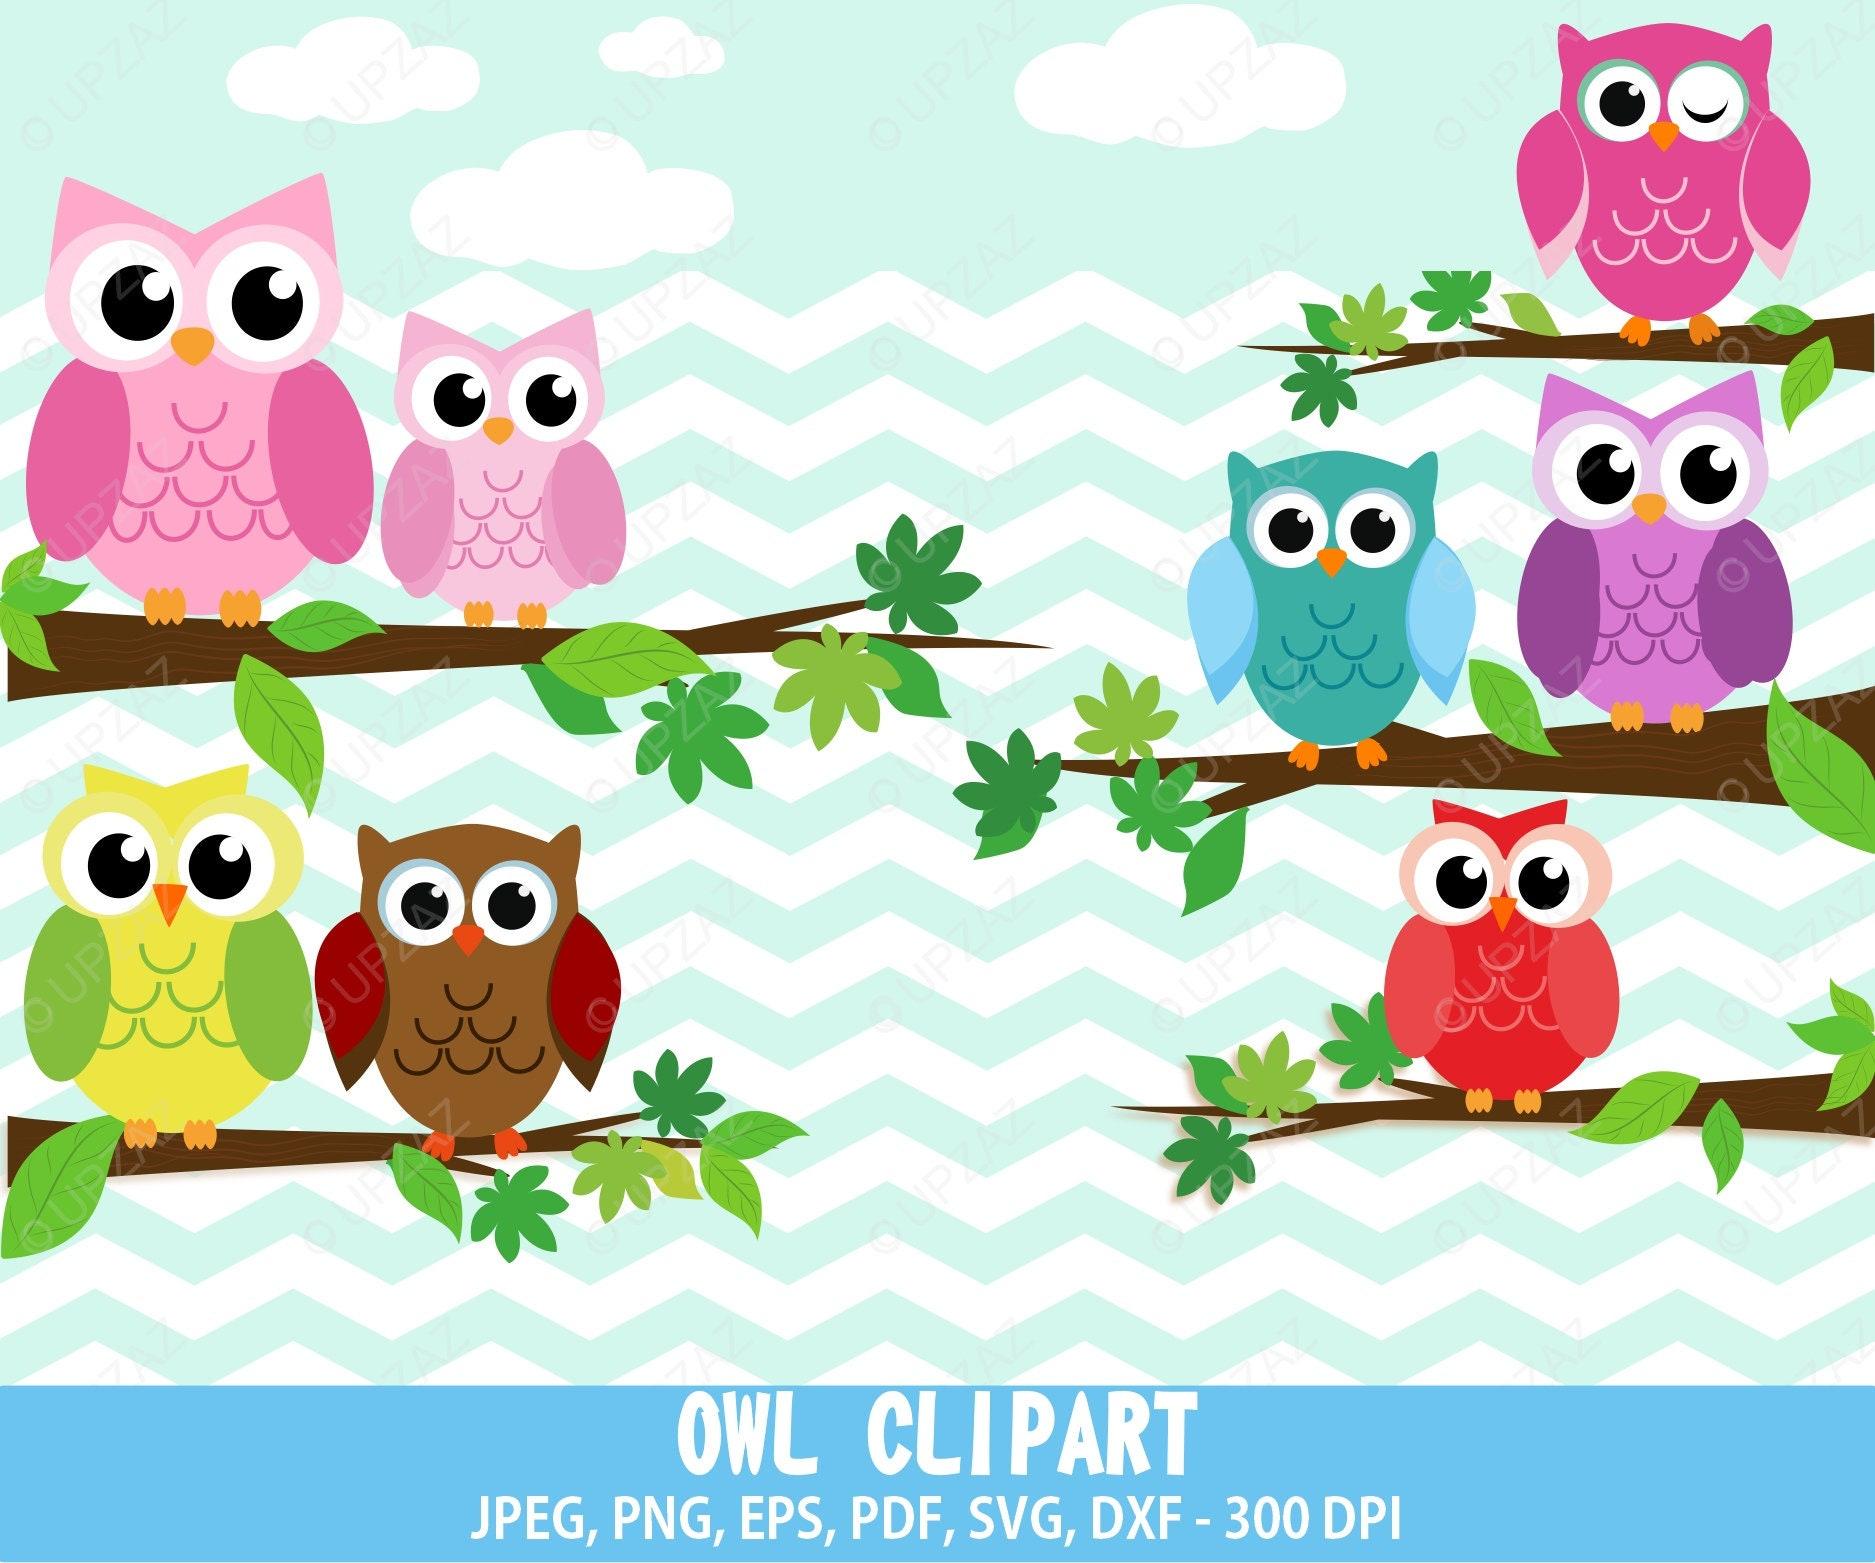 75% OFF SALE Owl Clipart Commercial Use UZ633 | Etsy